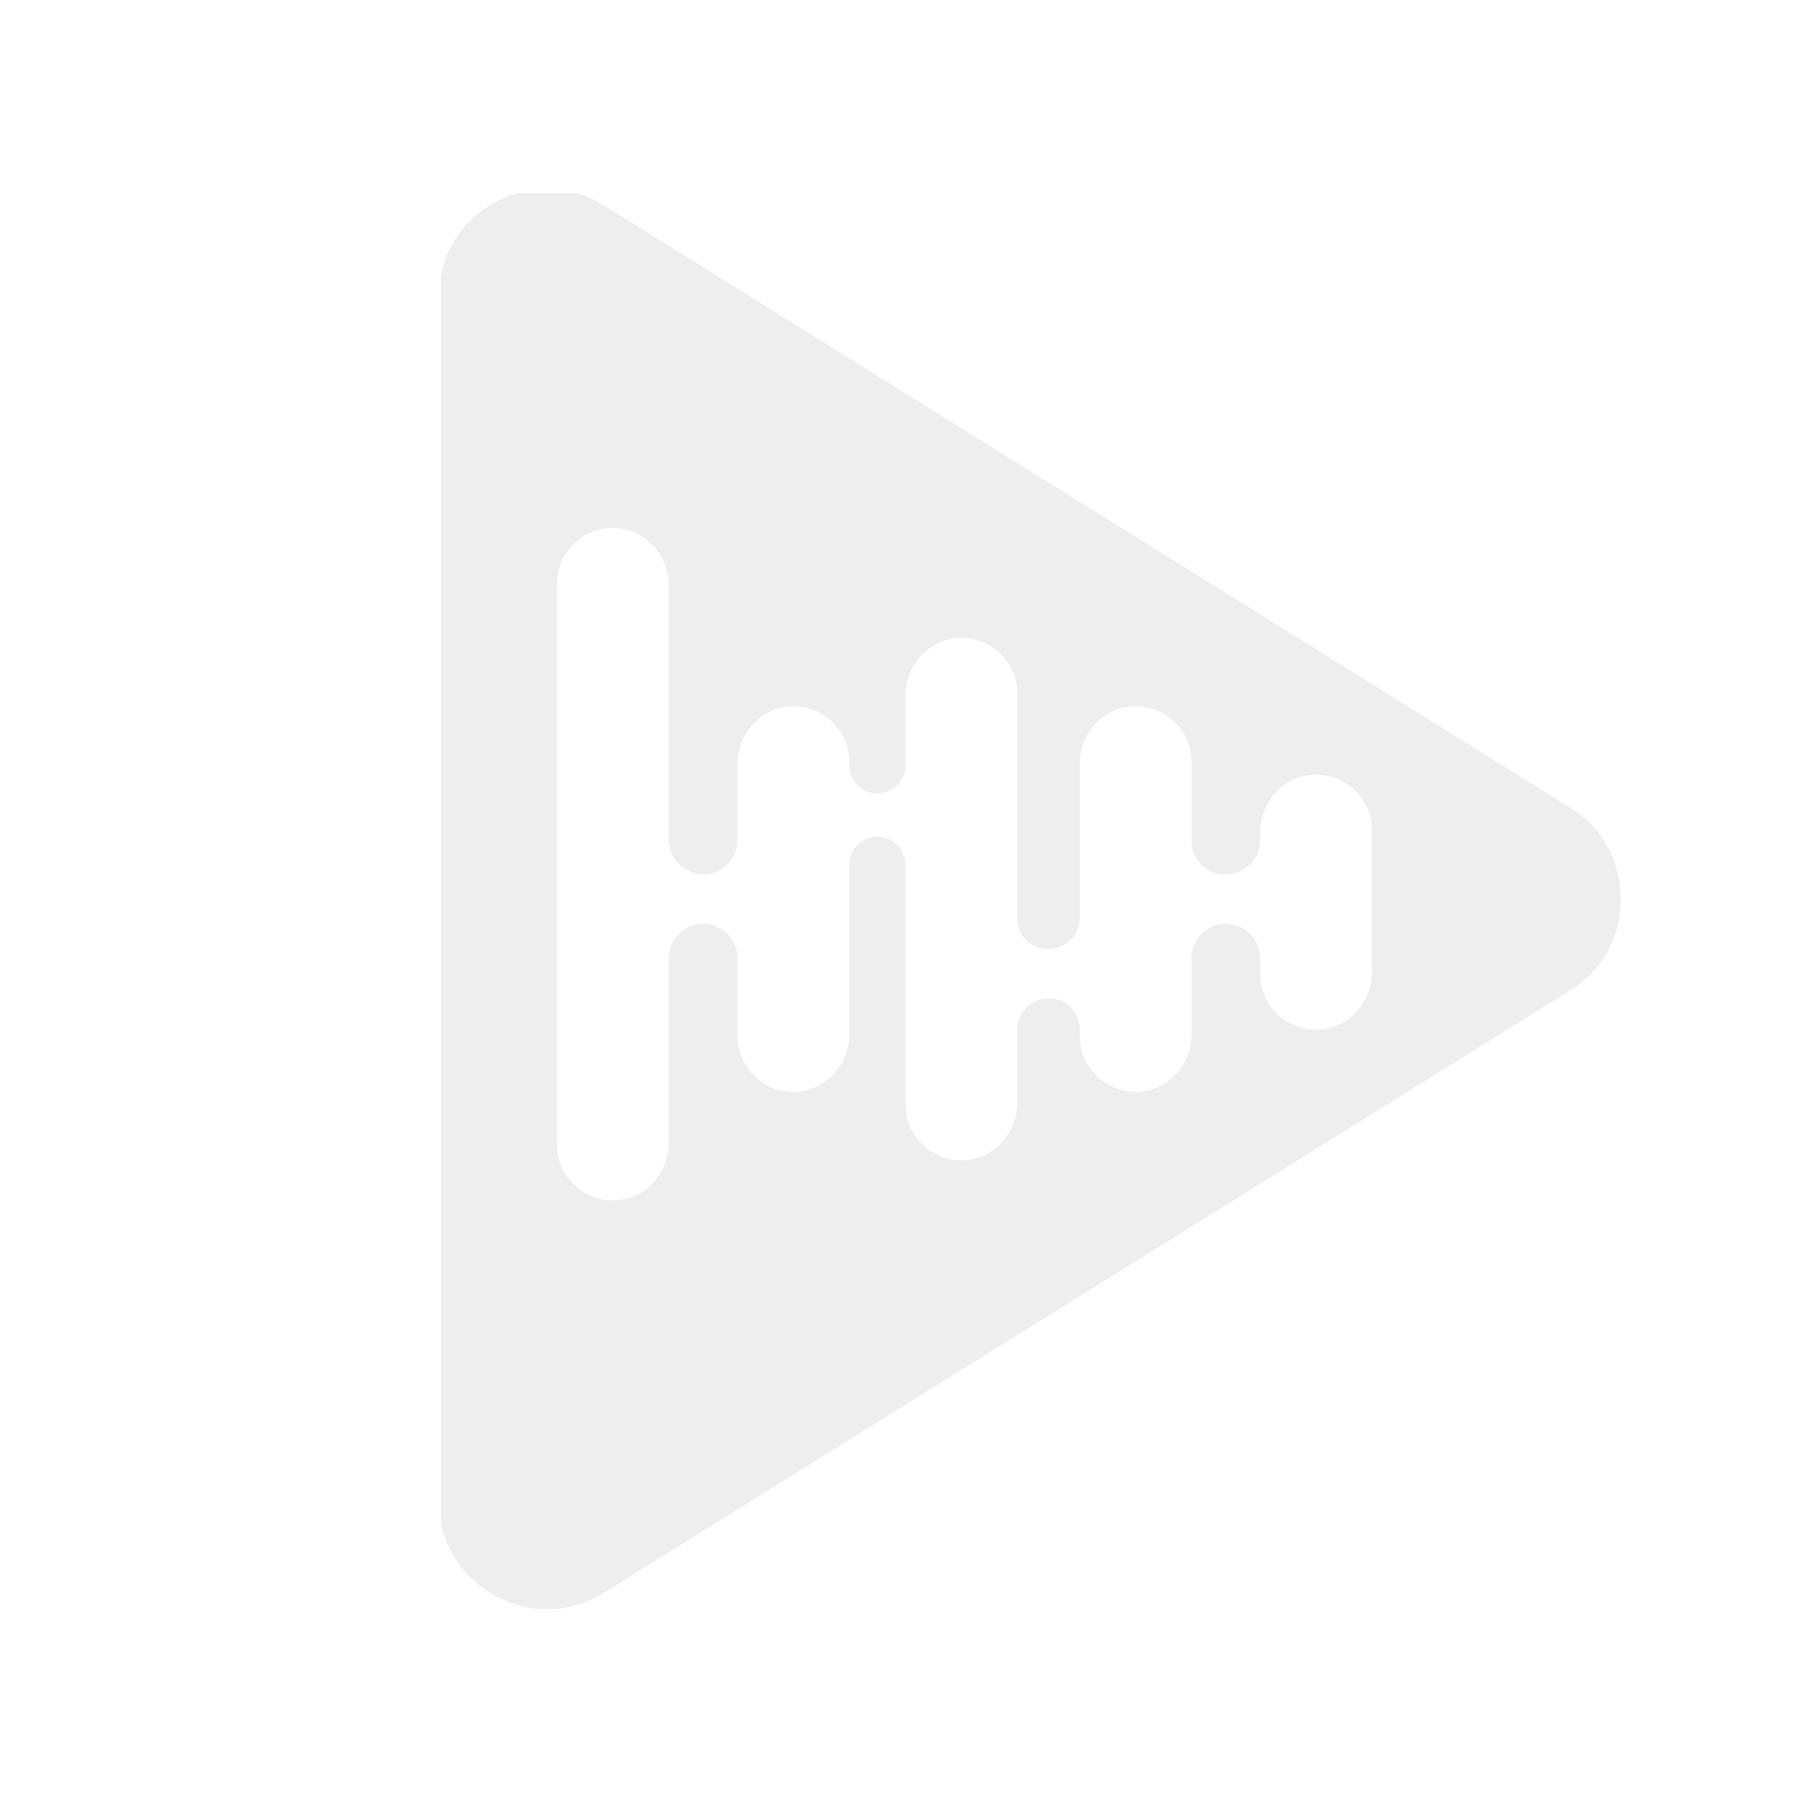 Kufatec Fistune 39702-2